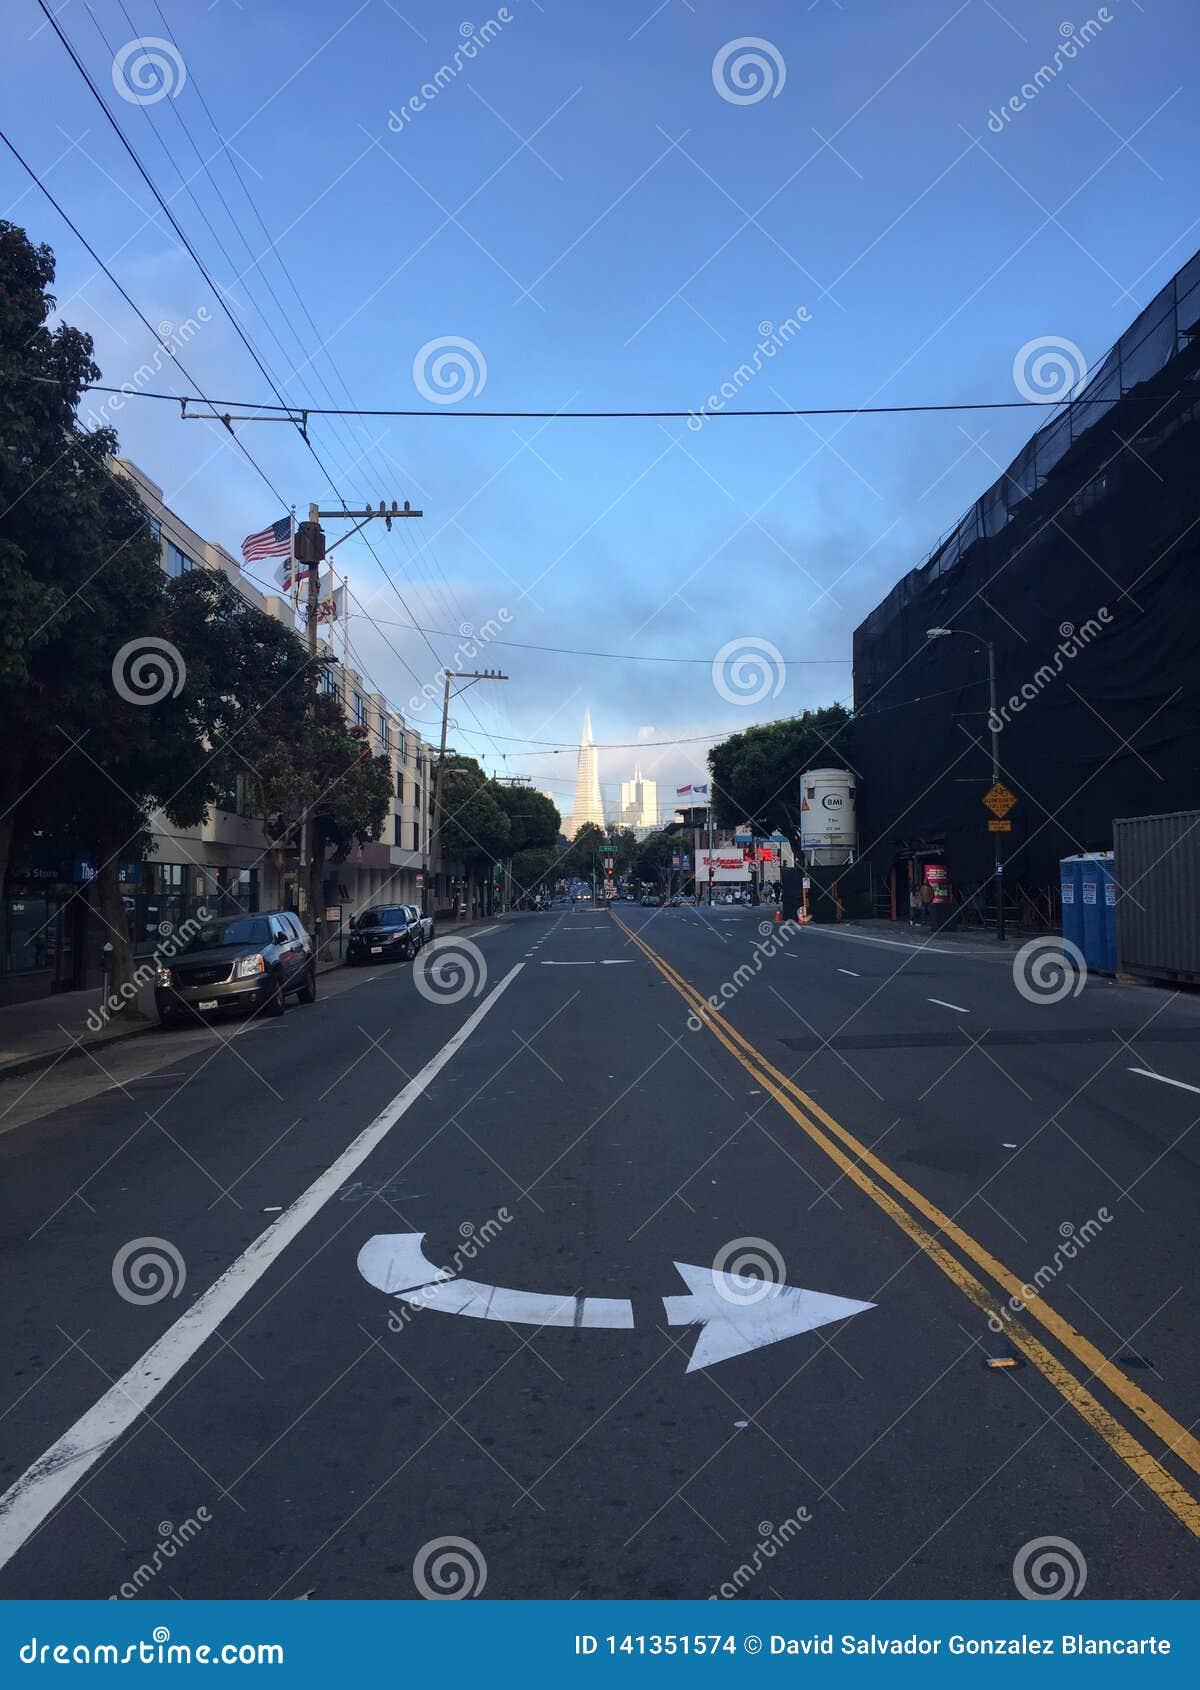 San Francisco KOMEND UIT HET ORIËNTATIEPUNT, DRAAI LINKS